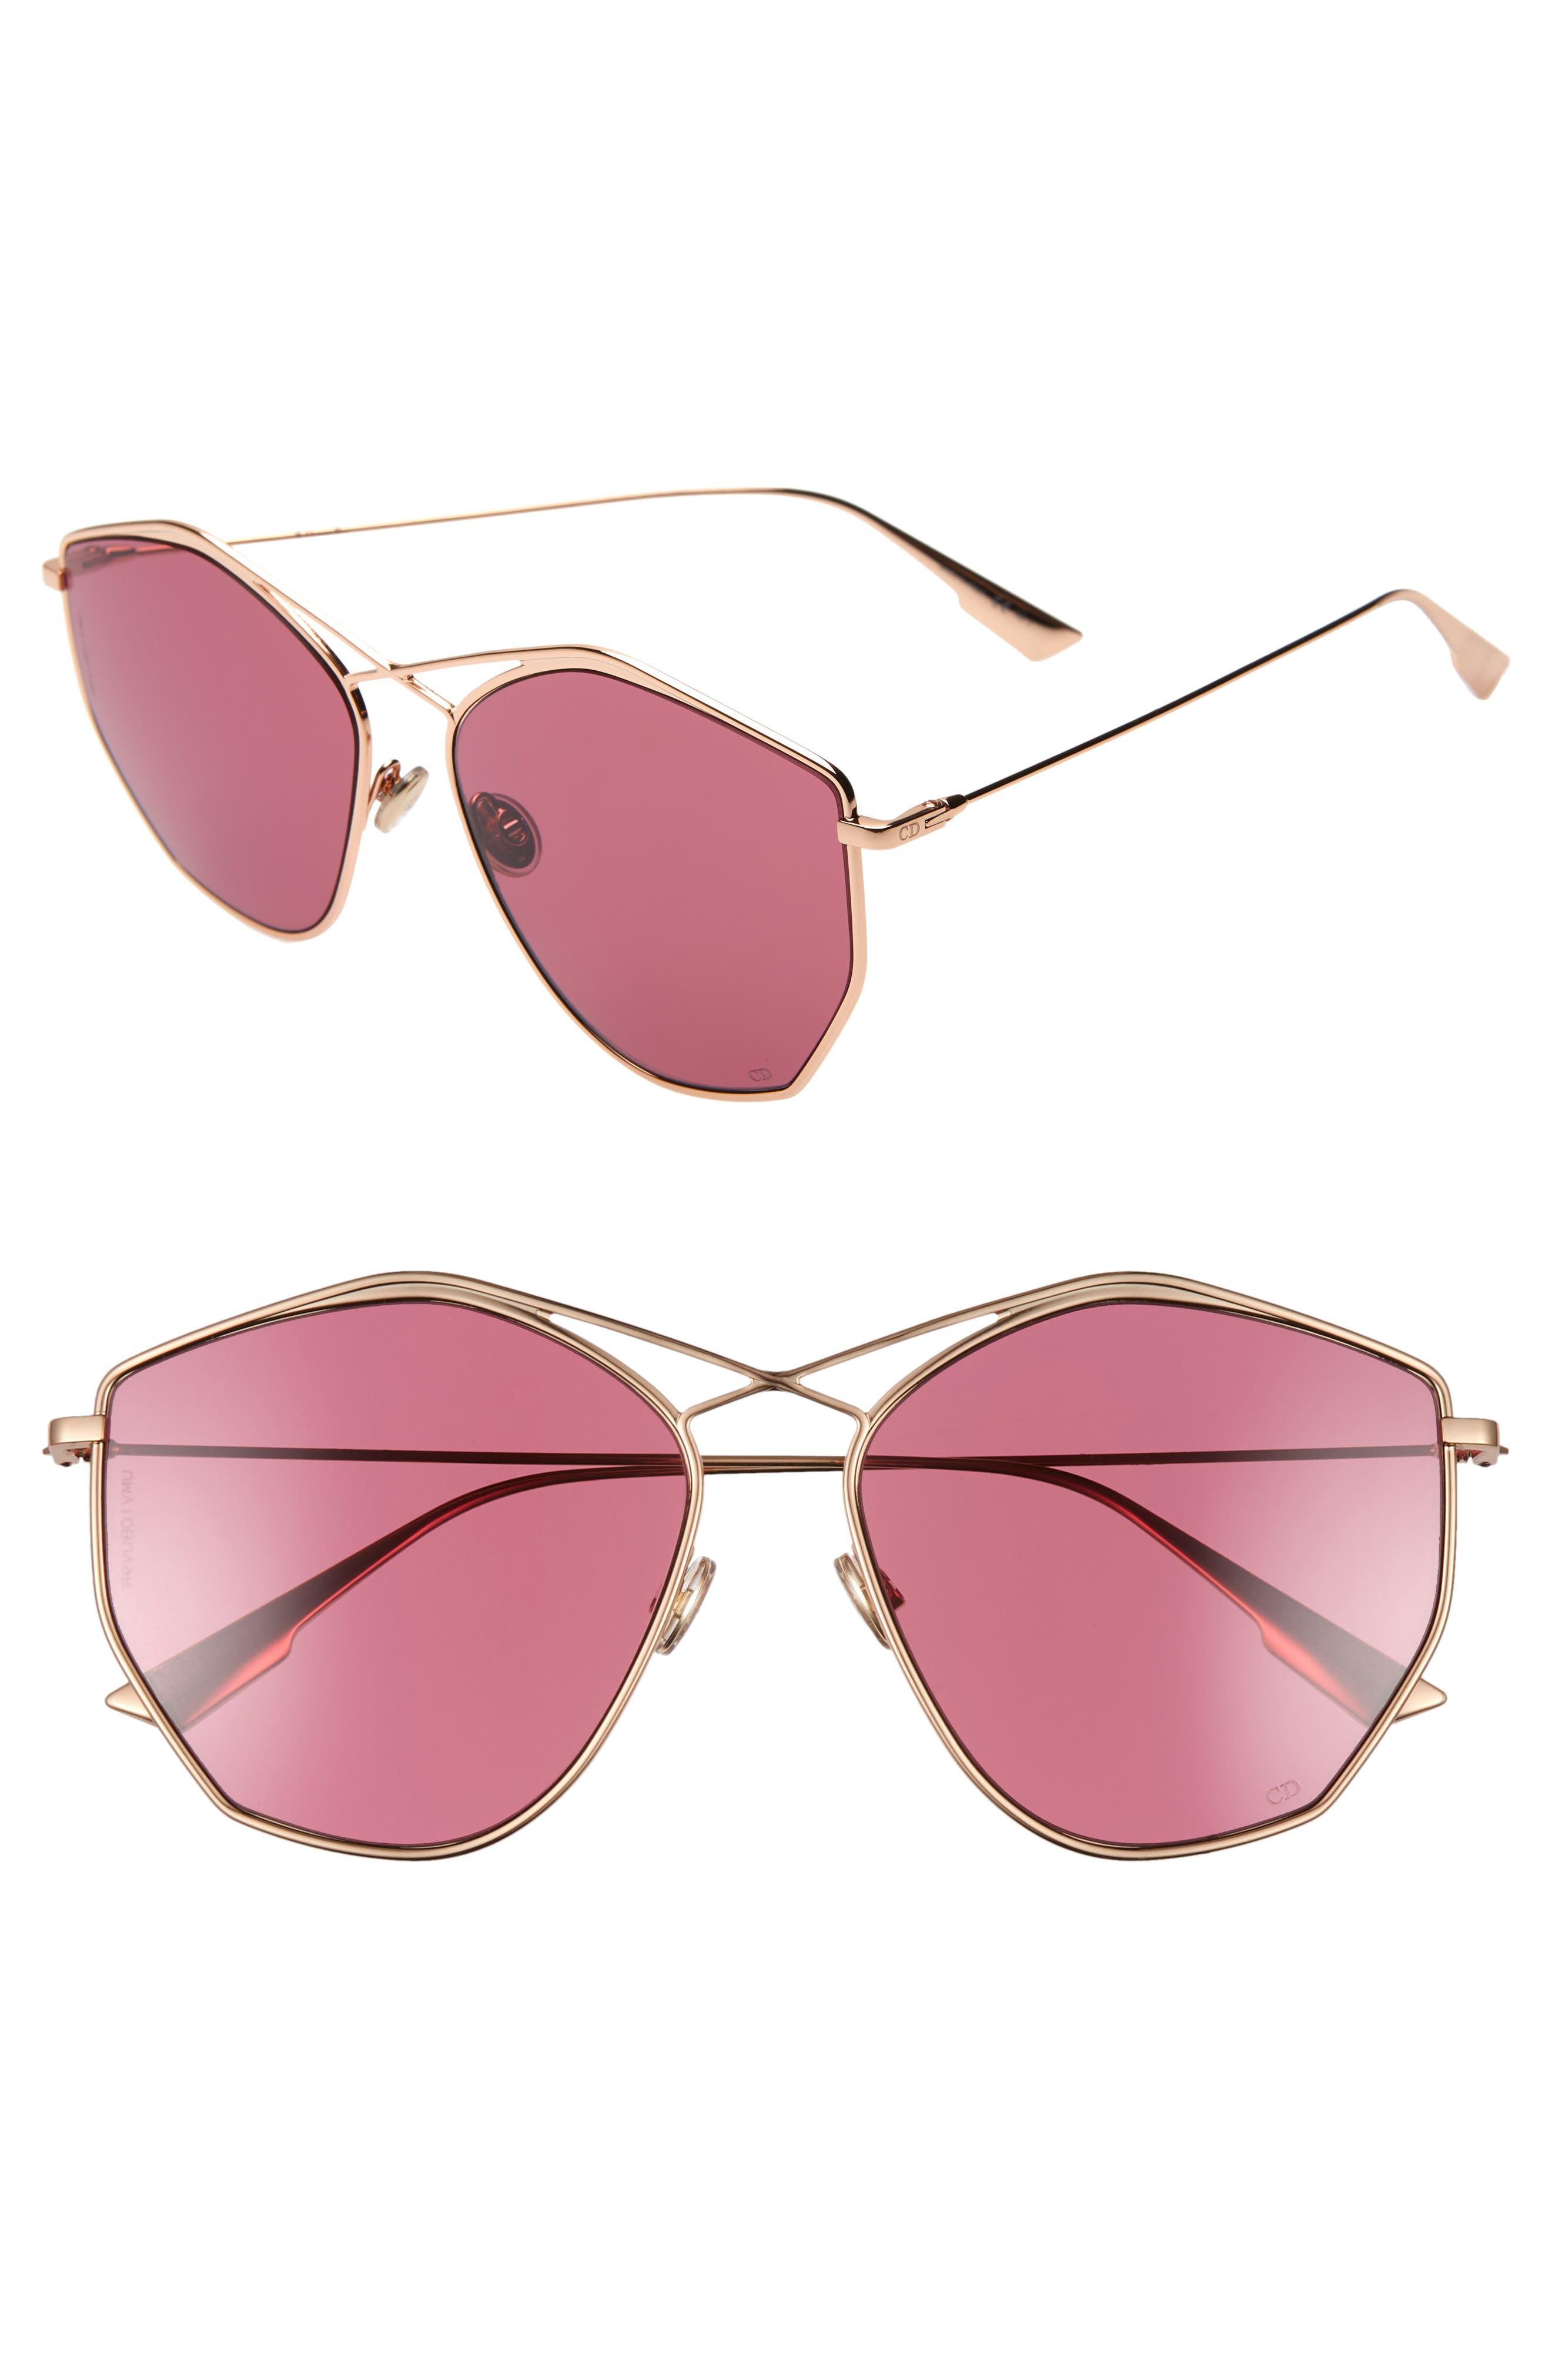 4c23d630d3fe Women s Dior Designer Sunglasses